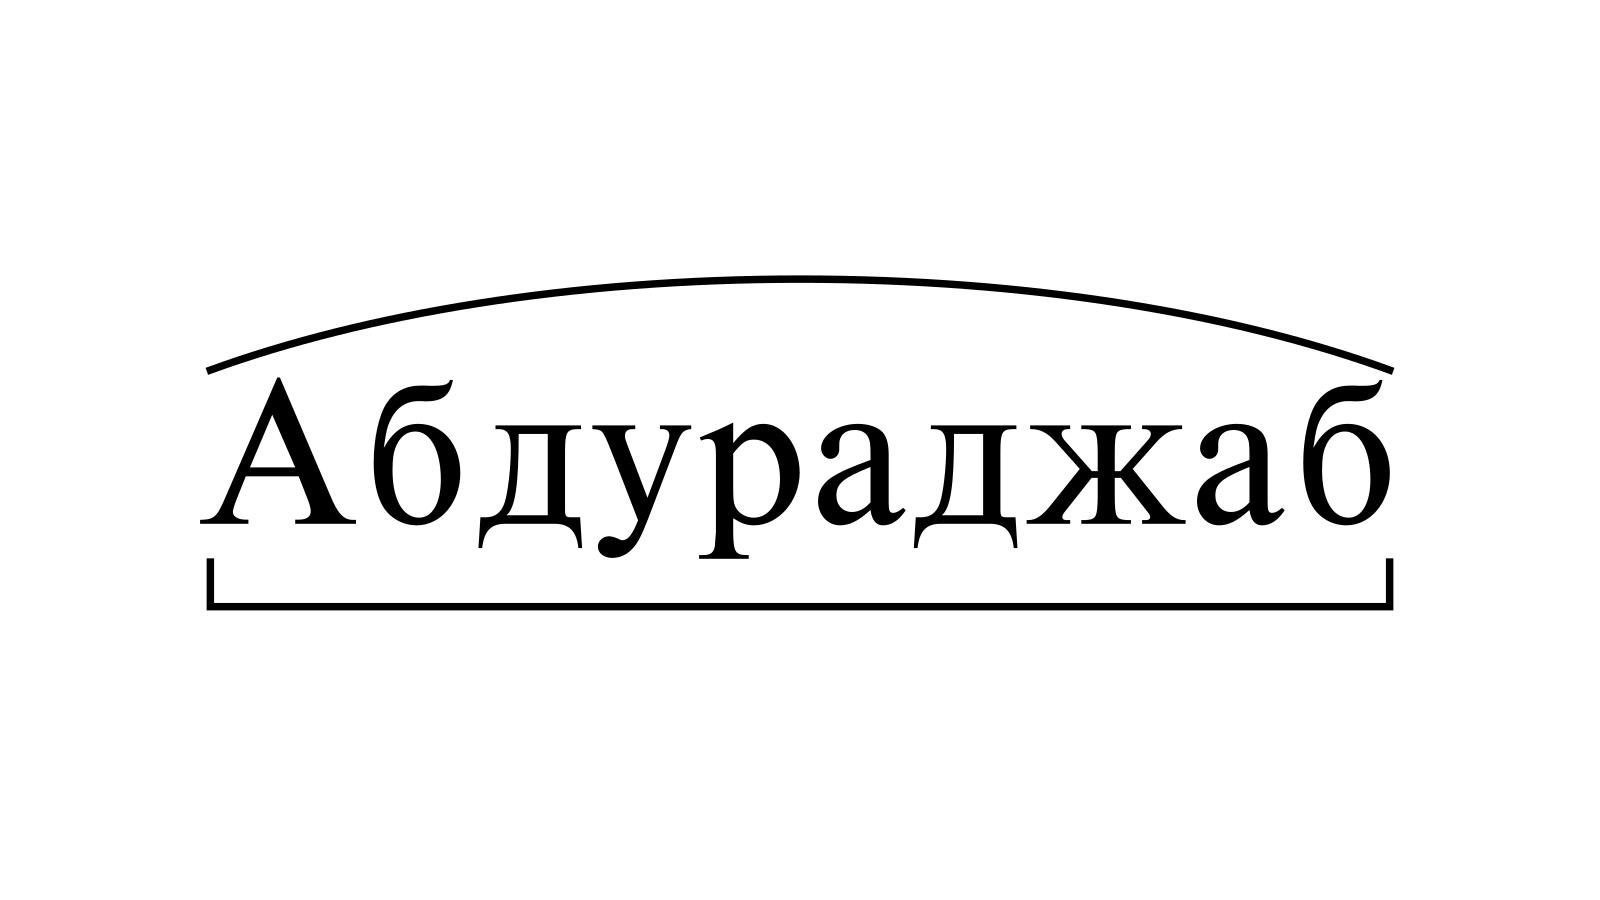 Разбор слова «Абдураджаб» по составу